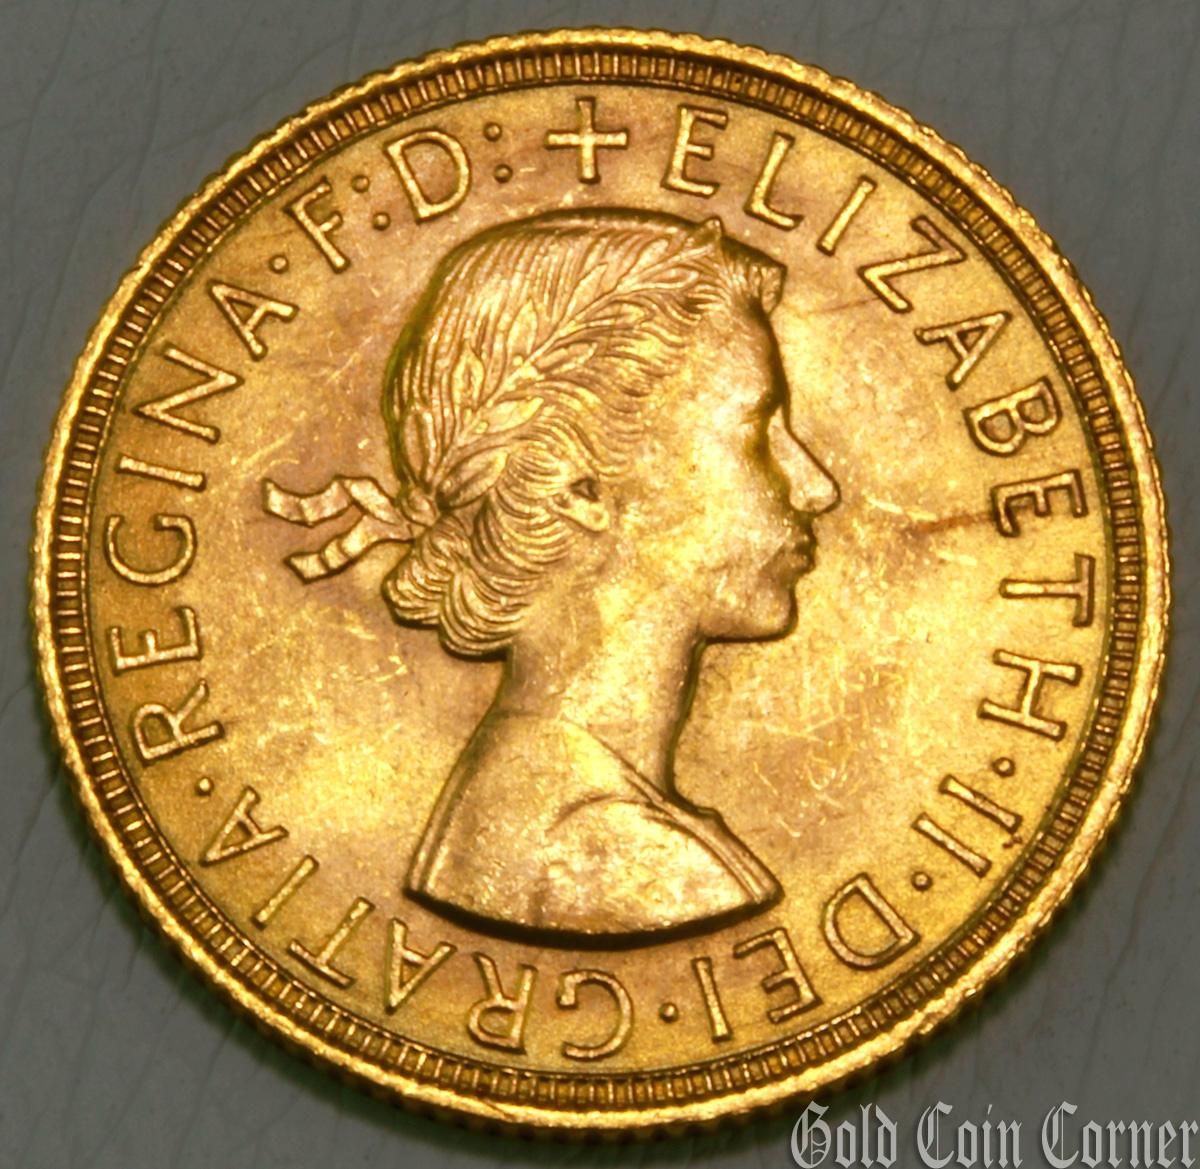 1958 elizabeth ii gold coin